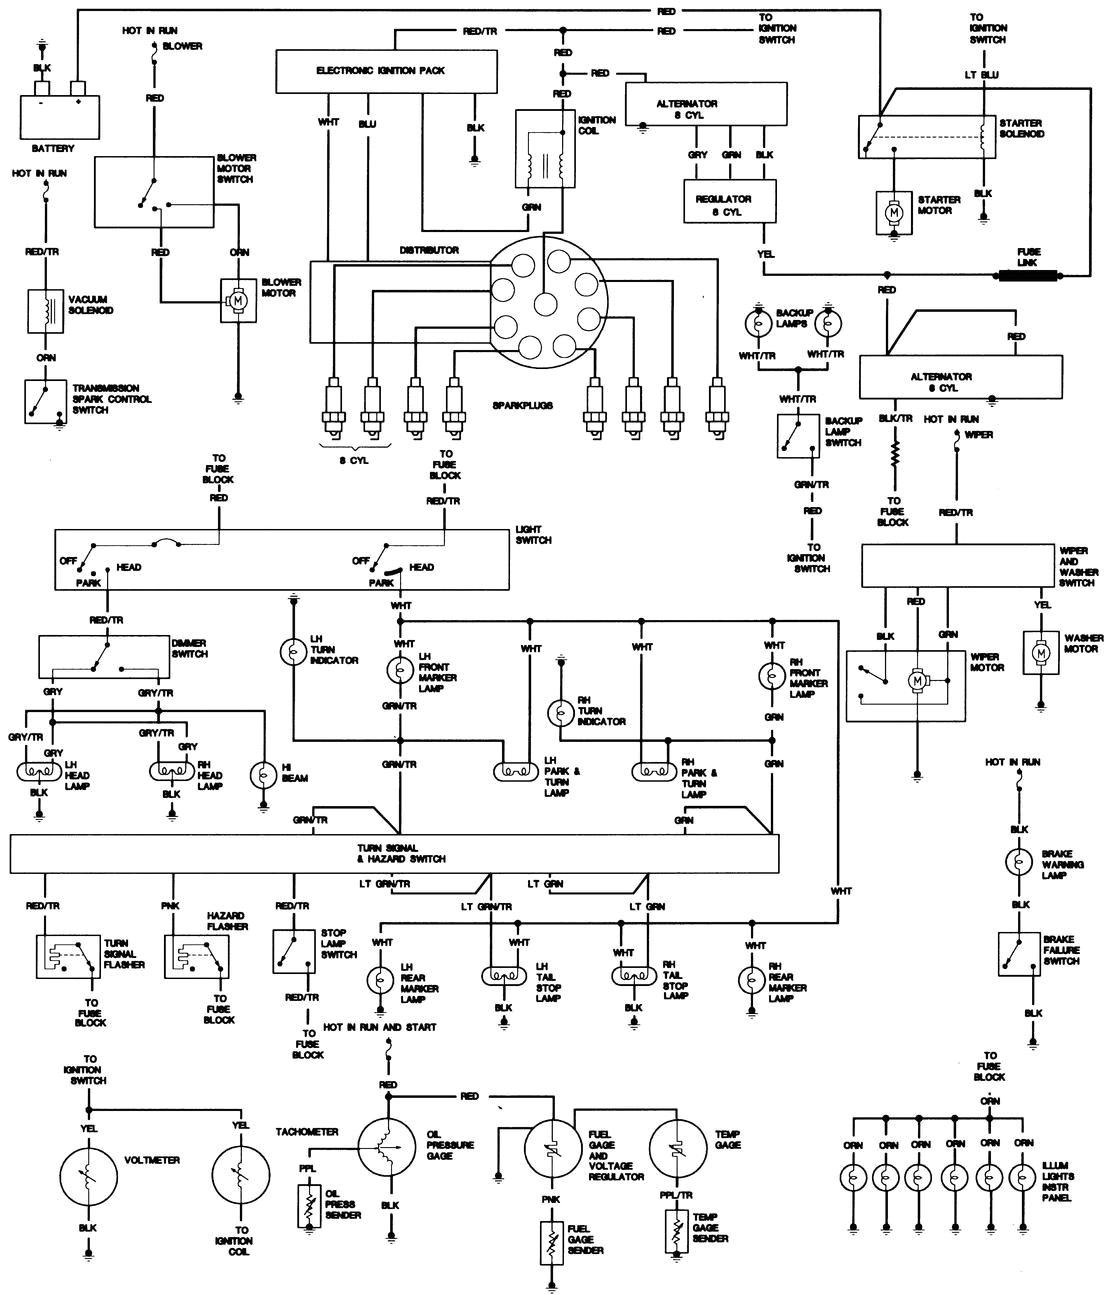 1977 jeep cj5 wiring harness wiring diagram